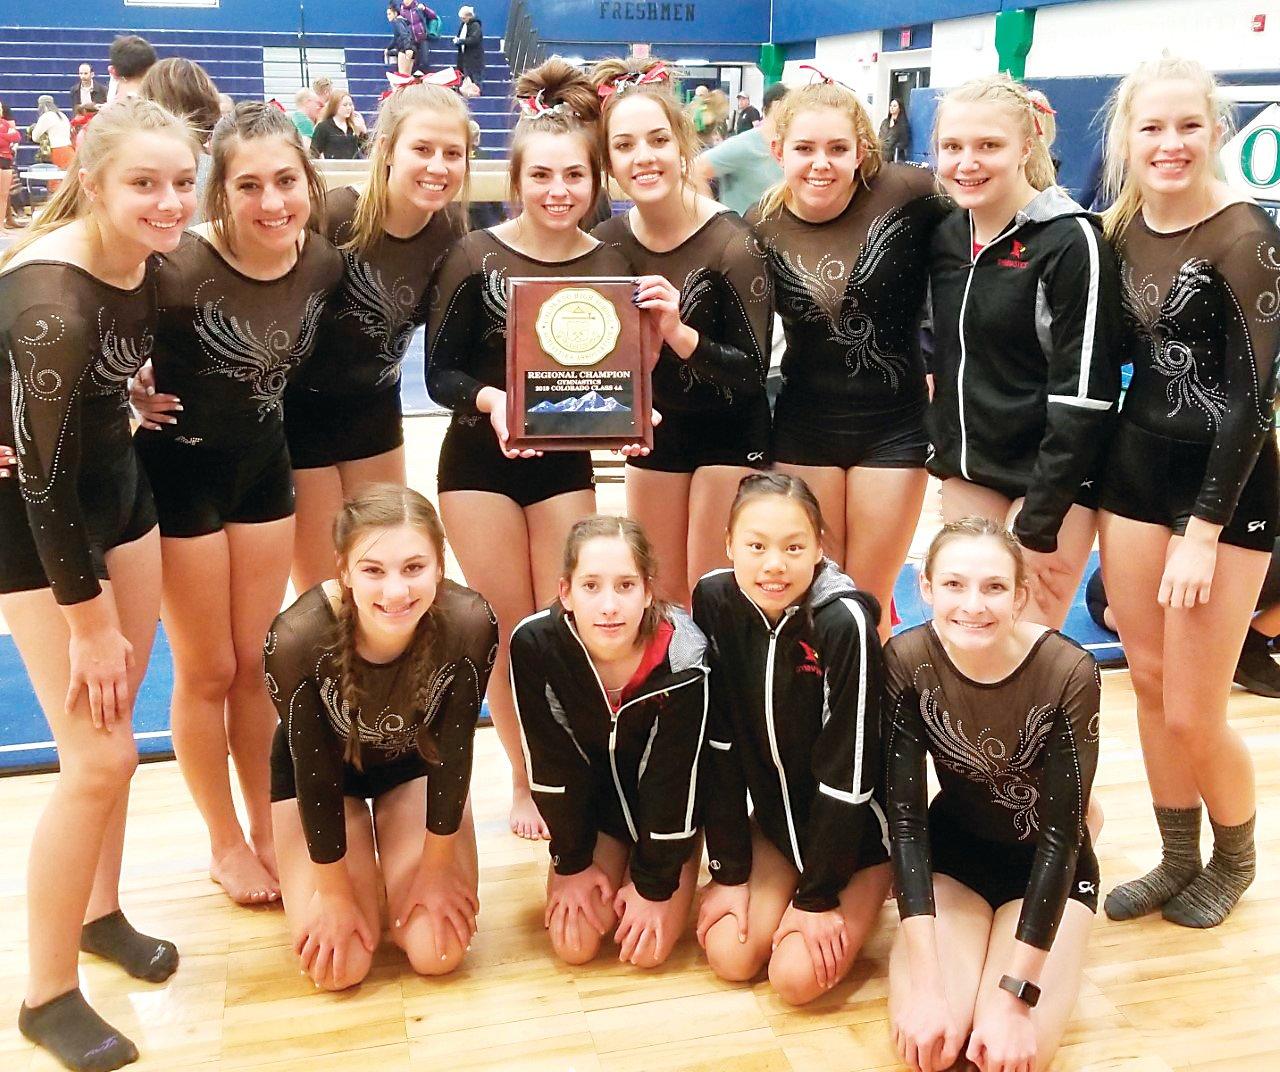 Elizabeth gymnastics team wins state crown - Elbert County News